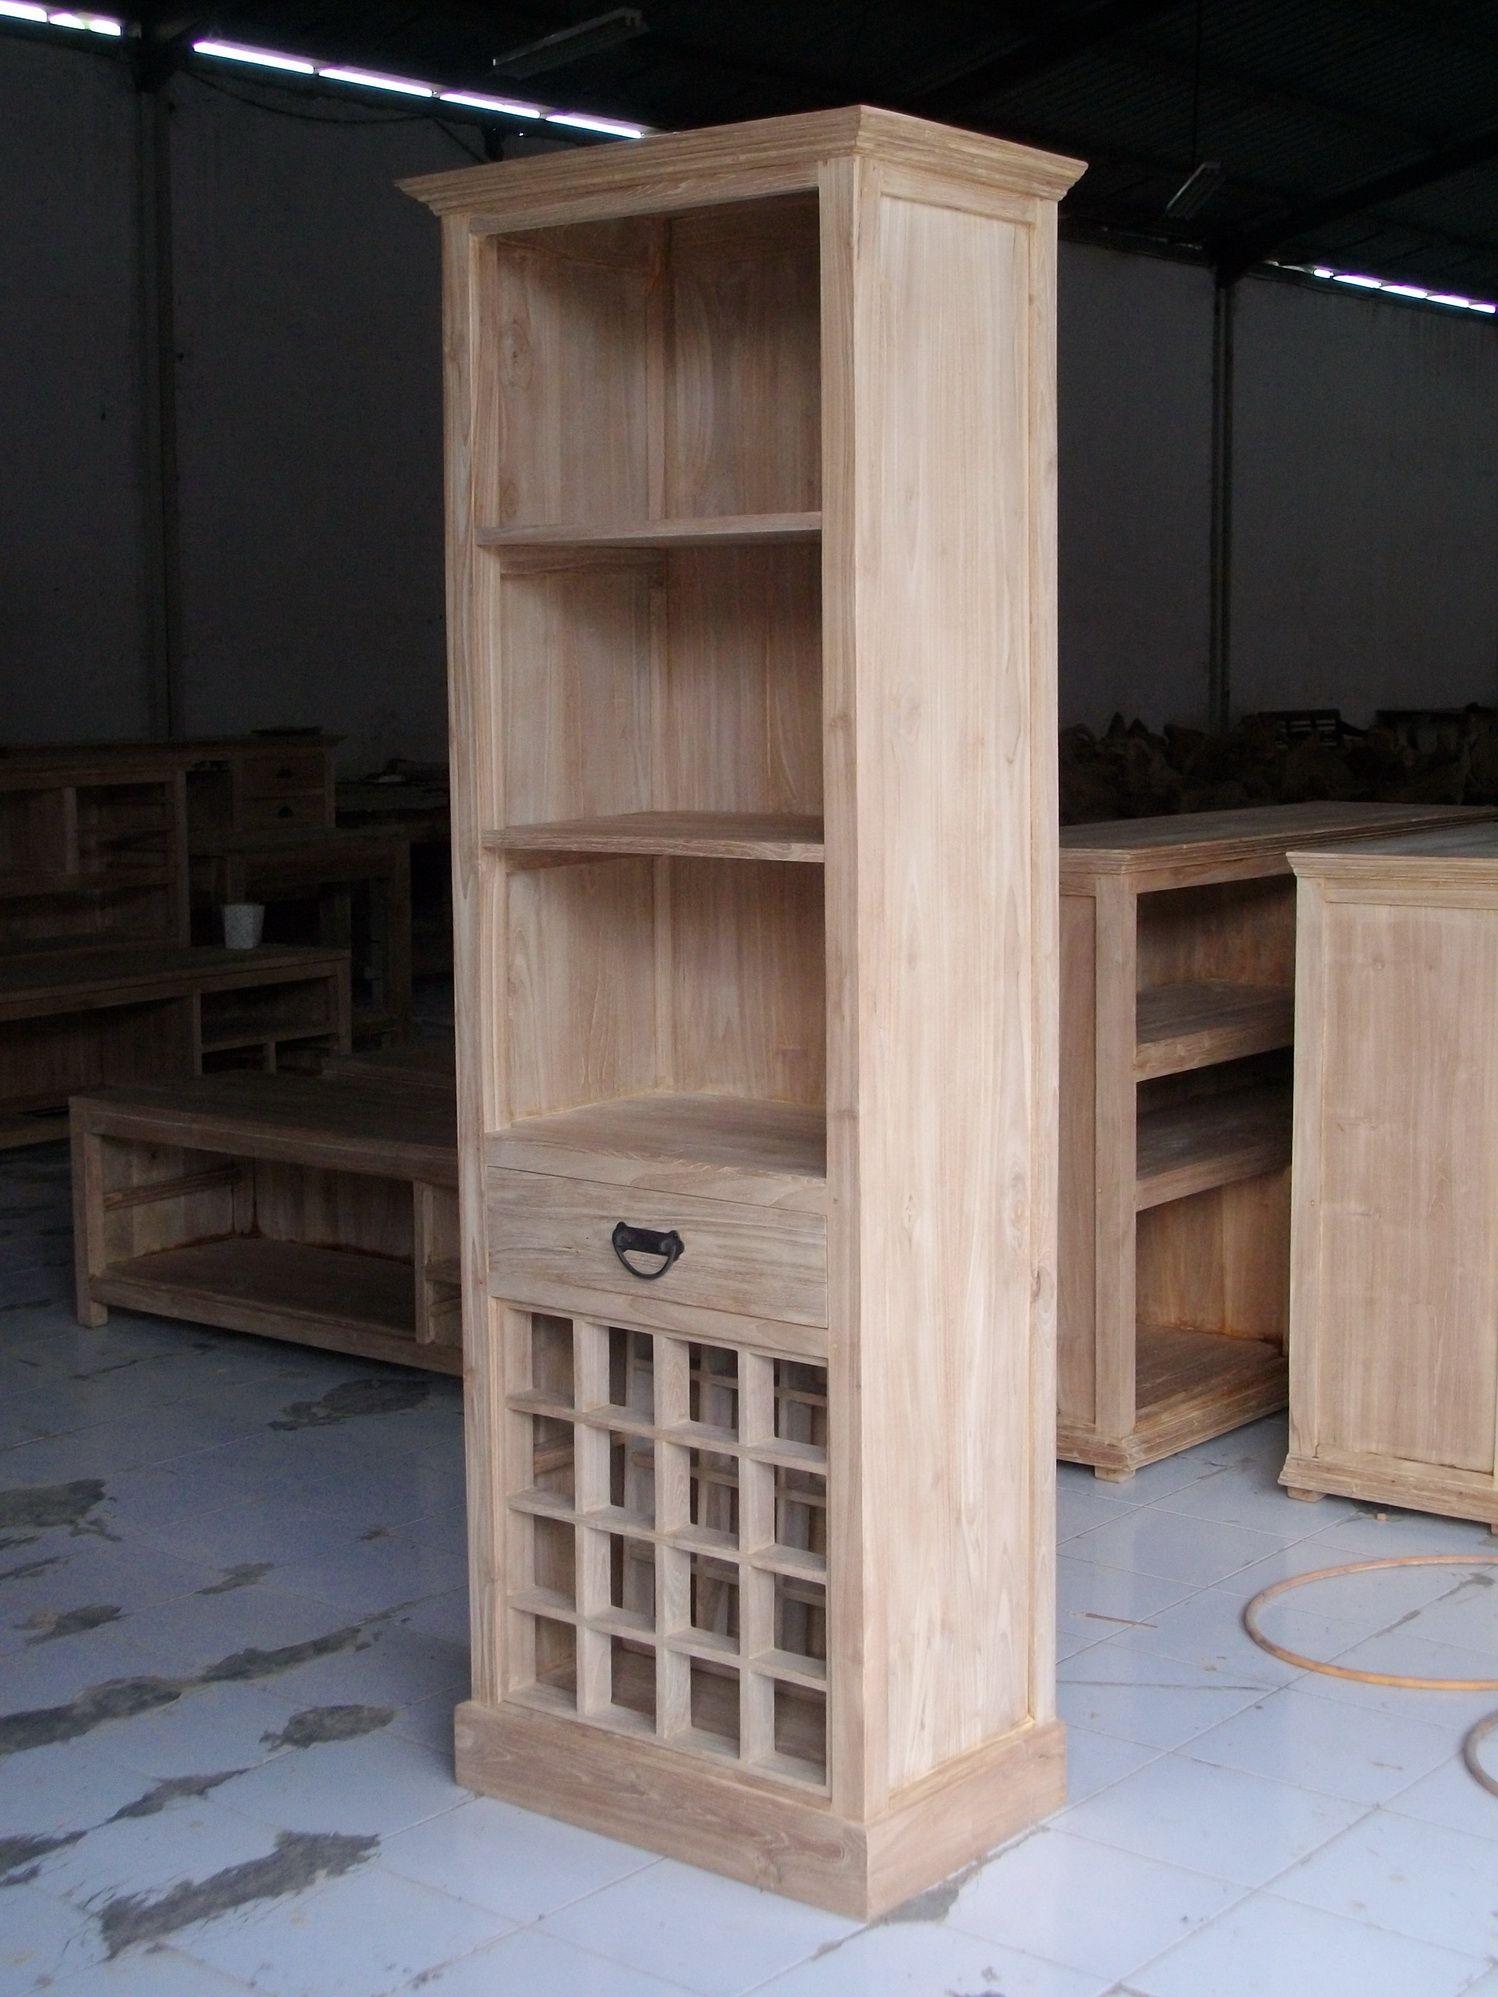 made from Teak Wood / Recycled Teak / Mahogany